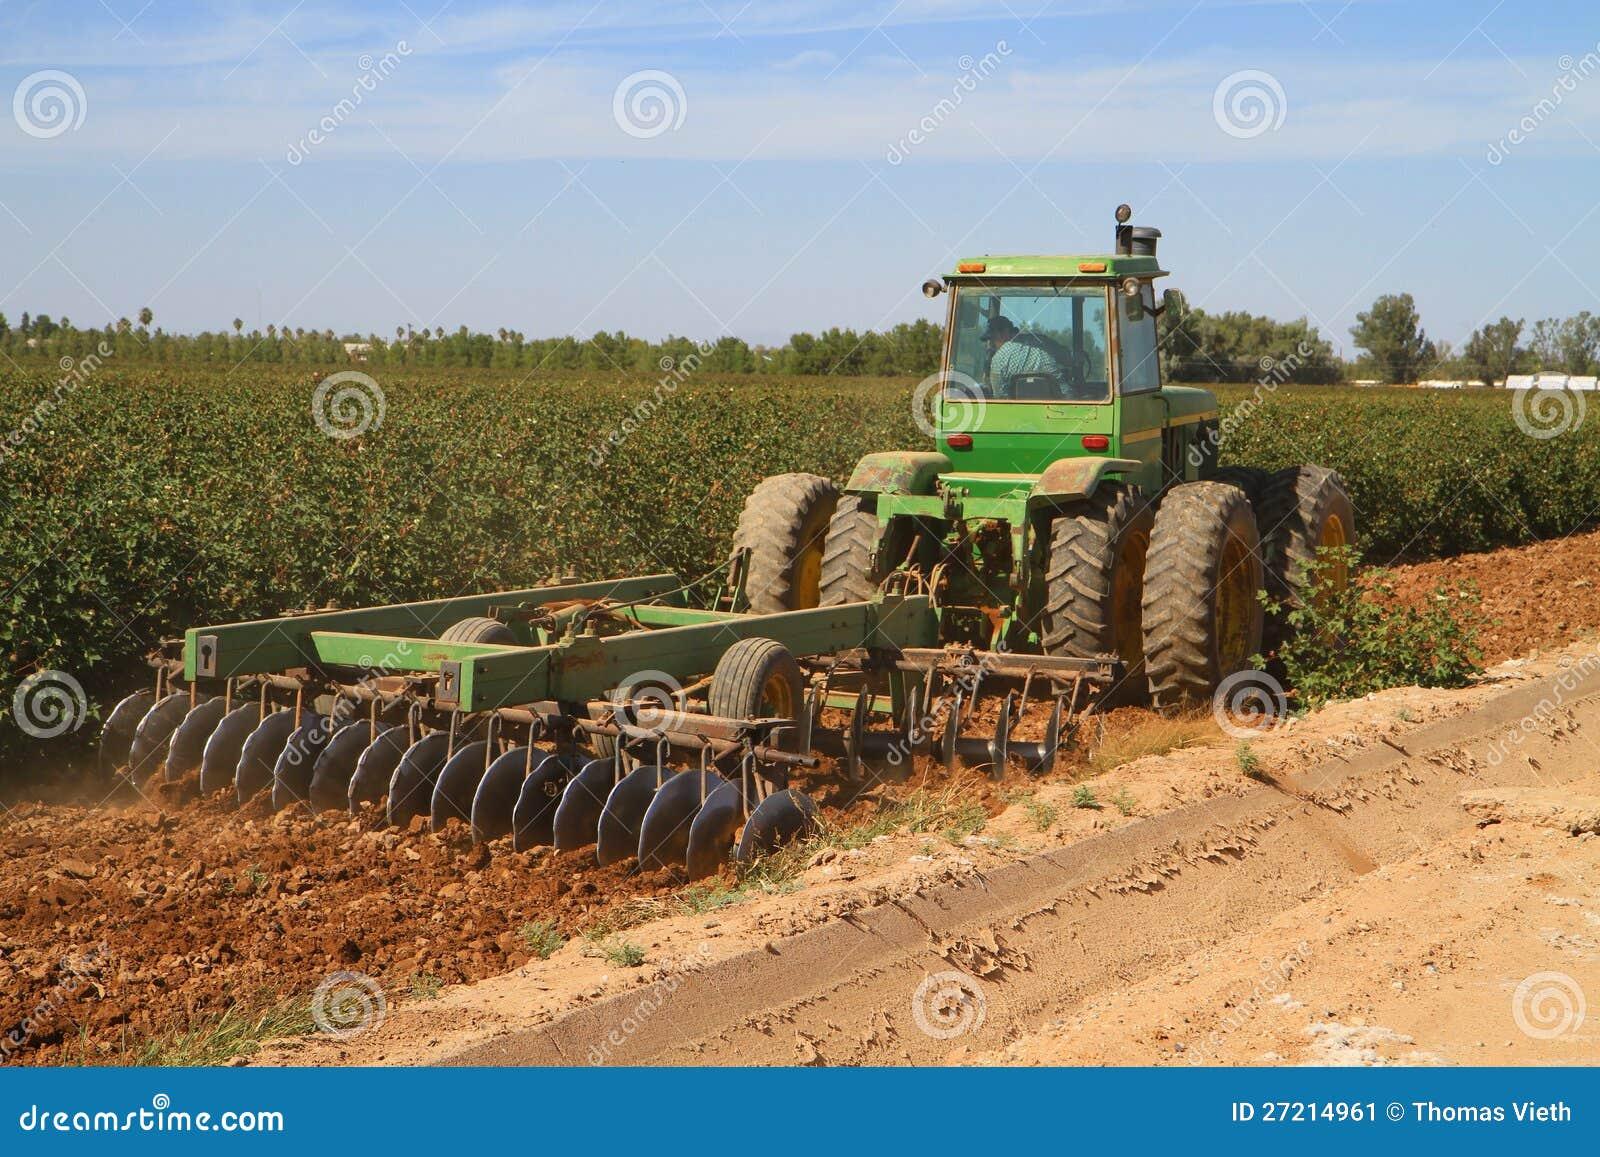 arizona agriculture harrowing cotton fields editorial john deere tractor clip art designs john deere tractor clipart images